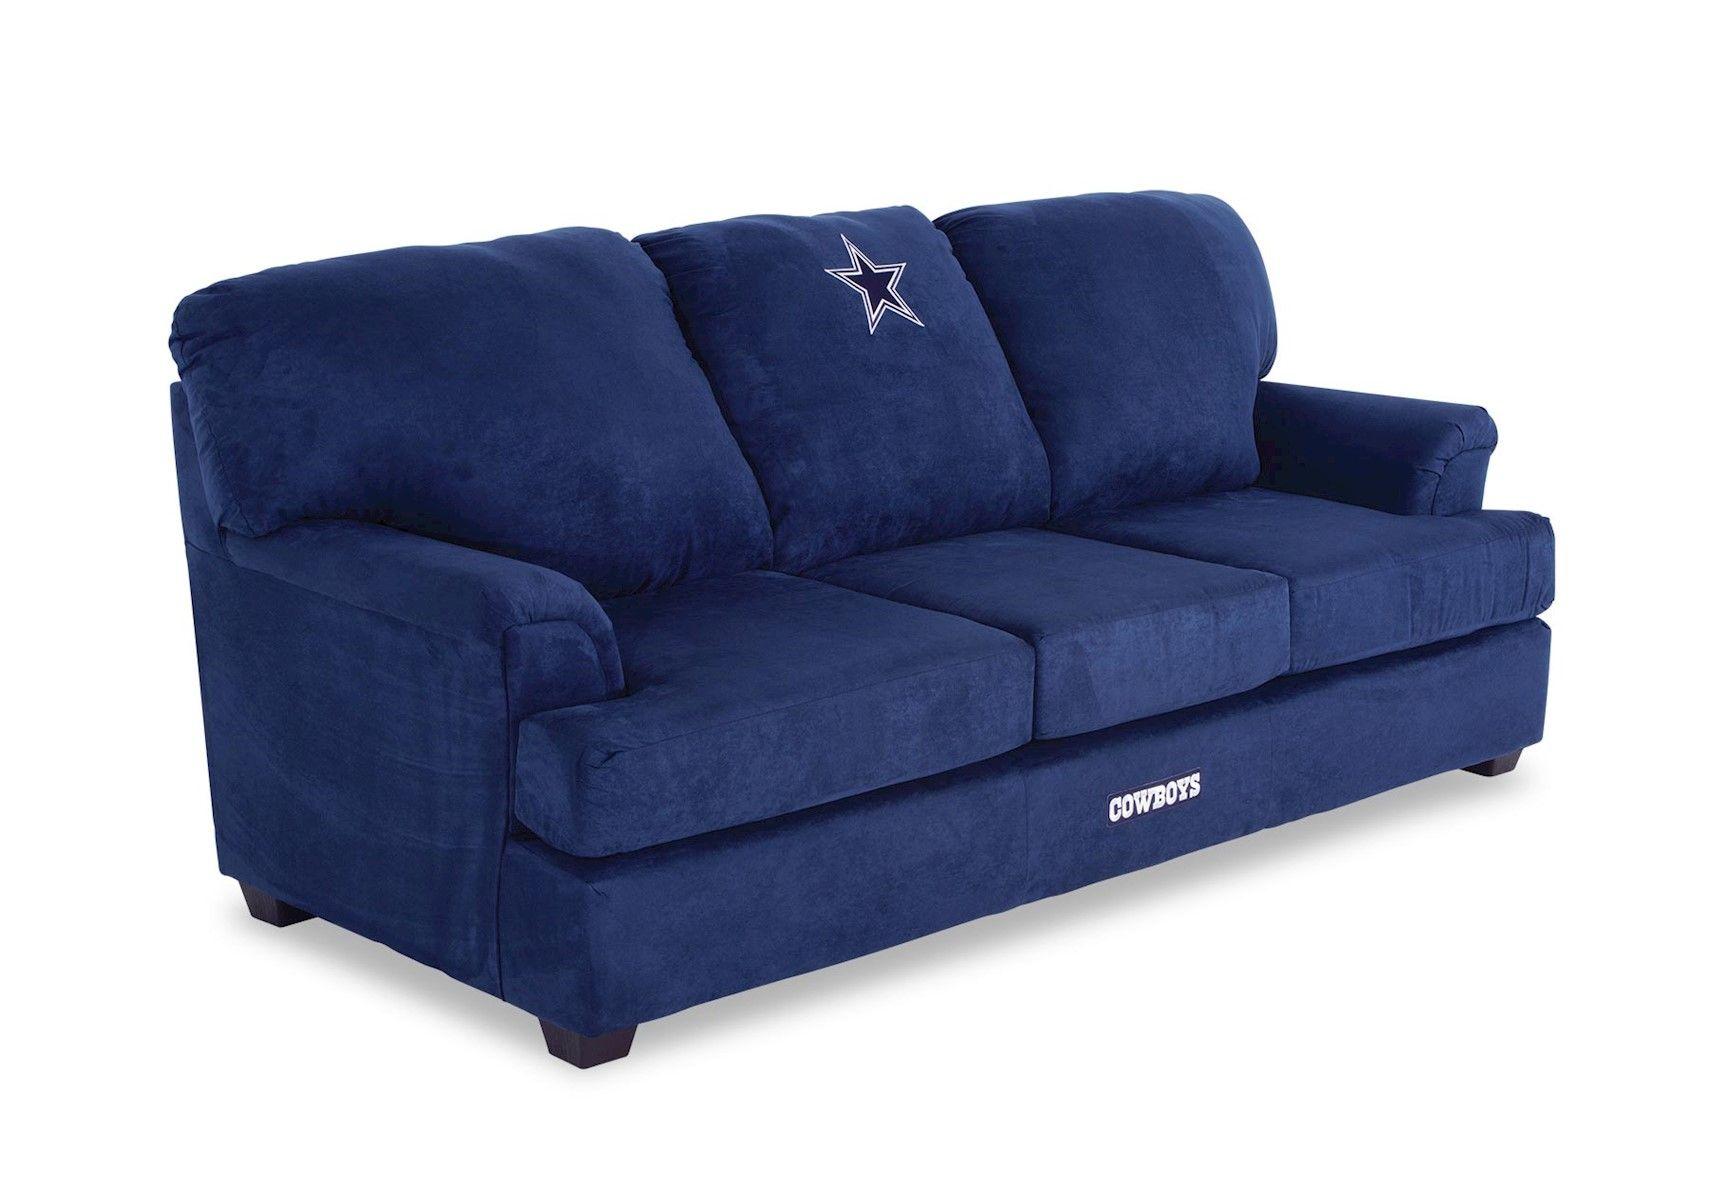 Lacks Dallas Cowboy Sofa Man Cave Must Haves